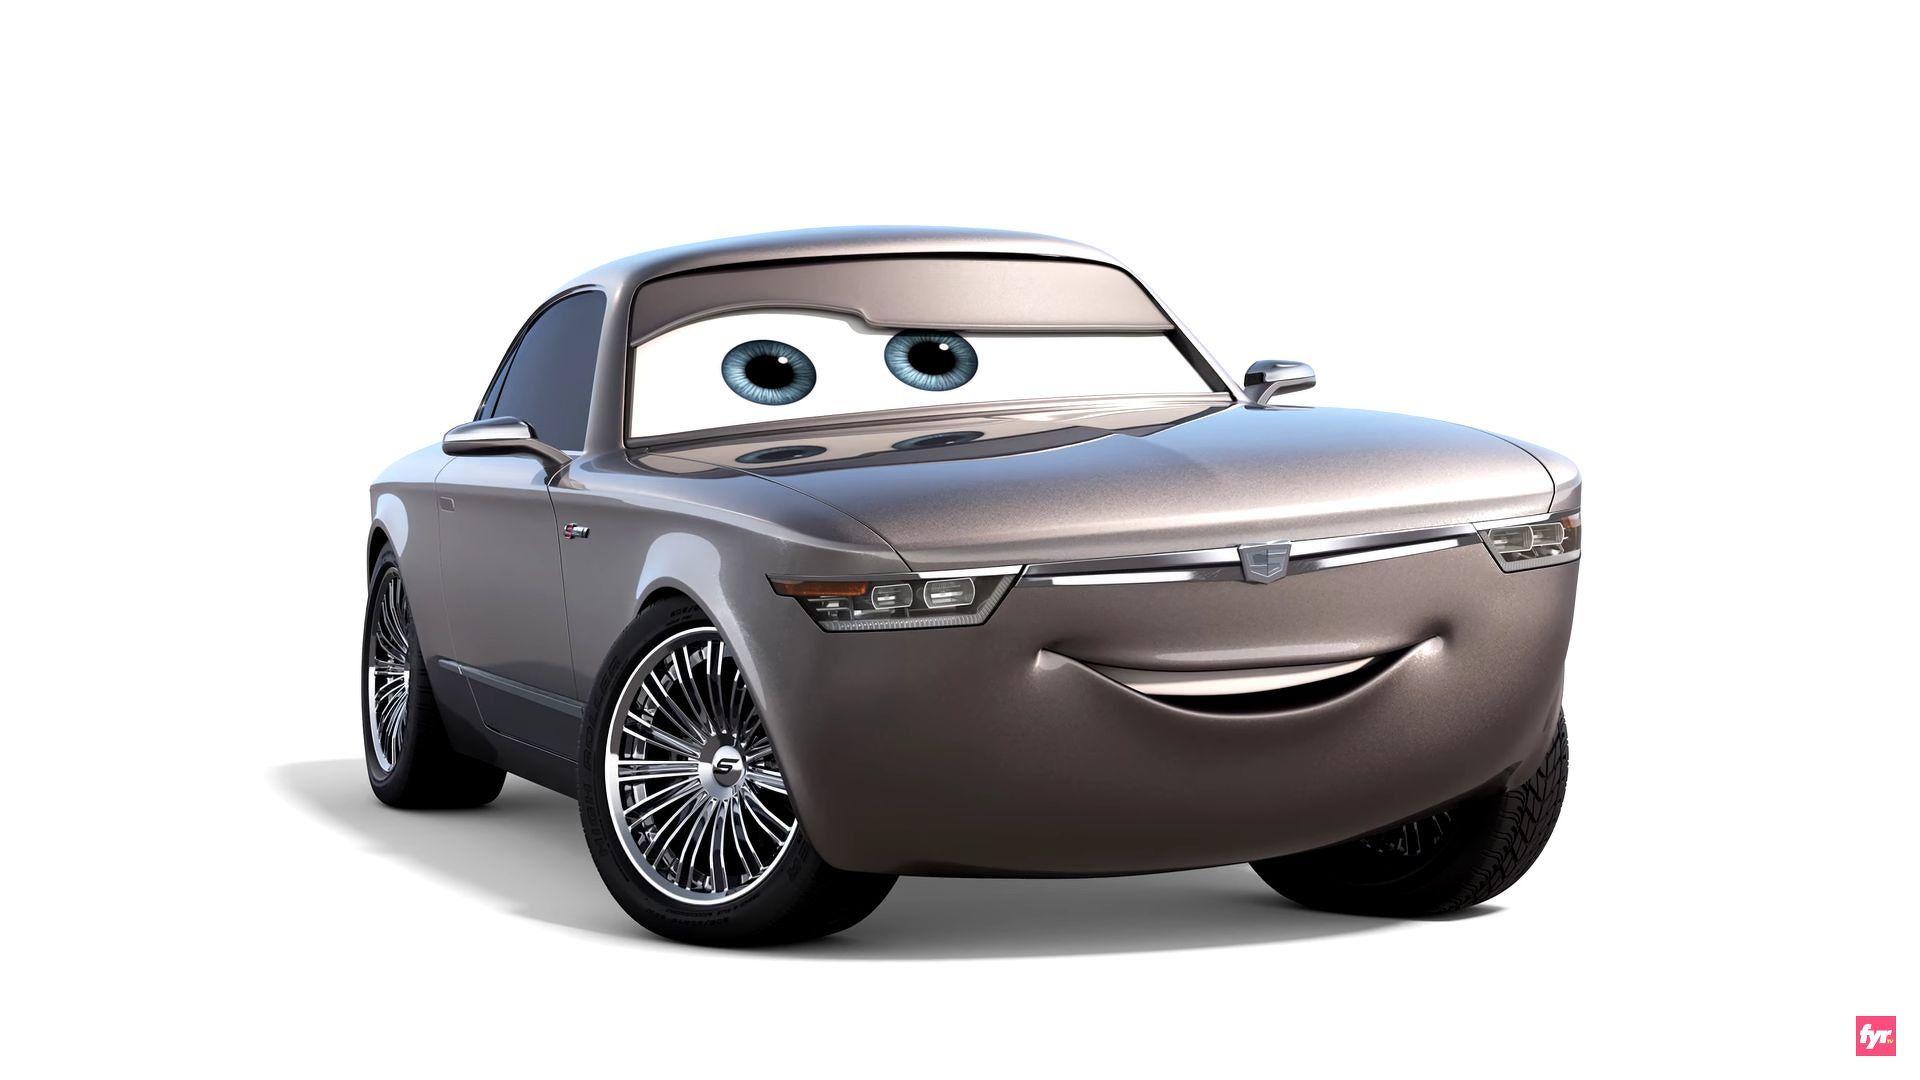 A Teslalike sedan named Natalie Certain and a demolition